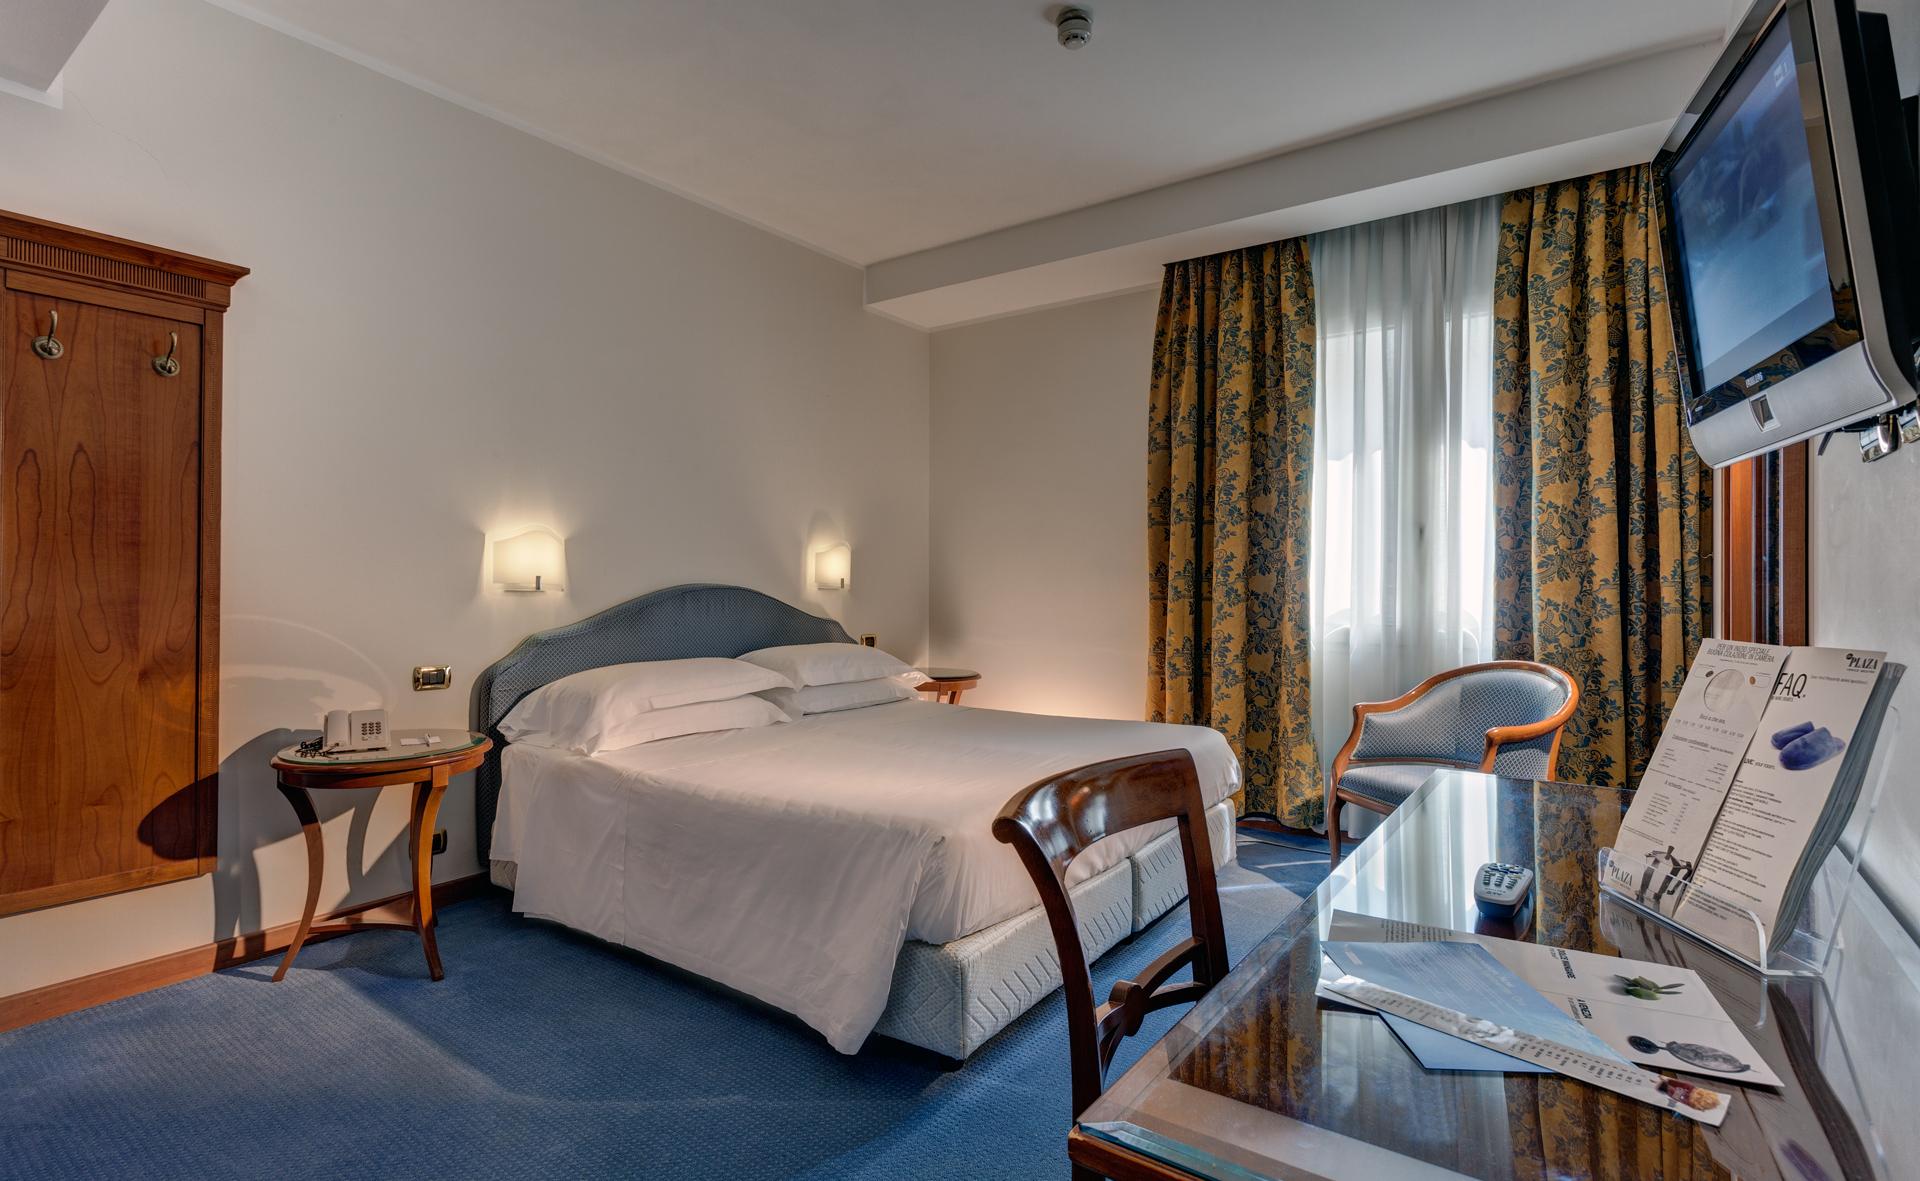 Hotel Plaza Venice dubbelrum(28 okt-5 nov)